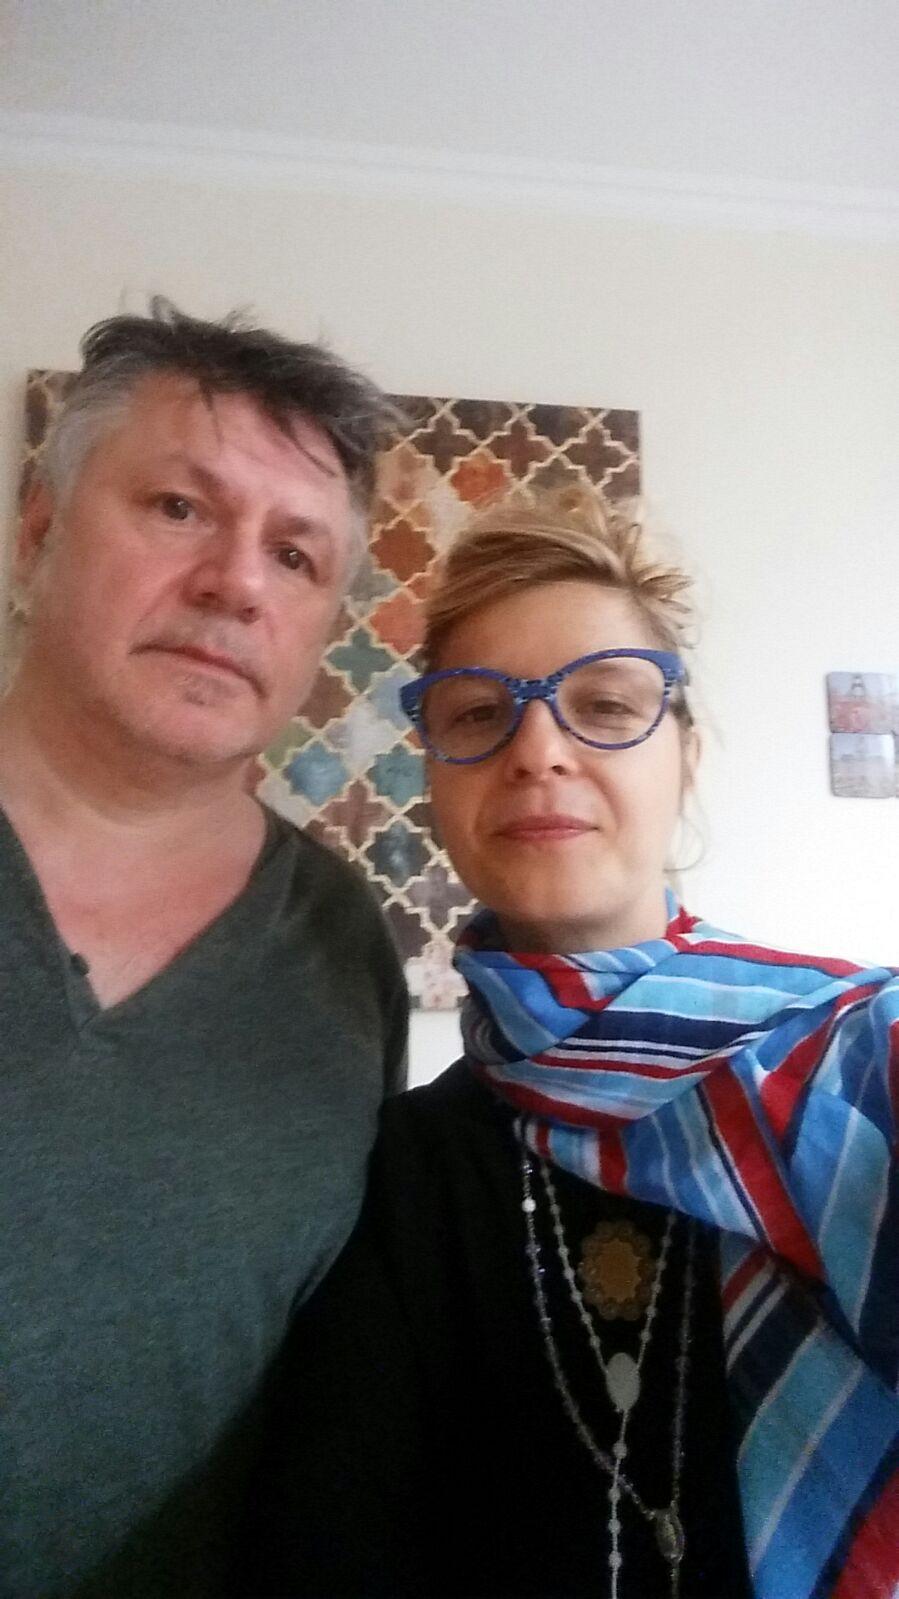 My EYE in Liverpool continues – Roberta La Guardia